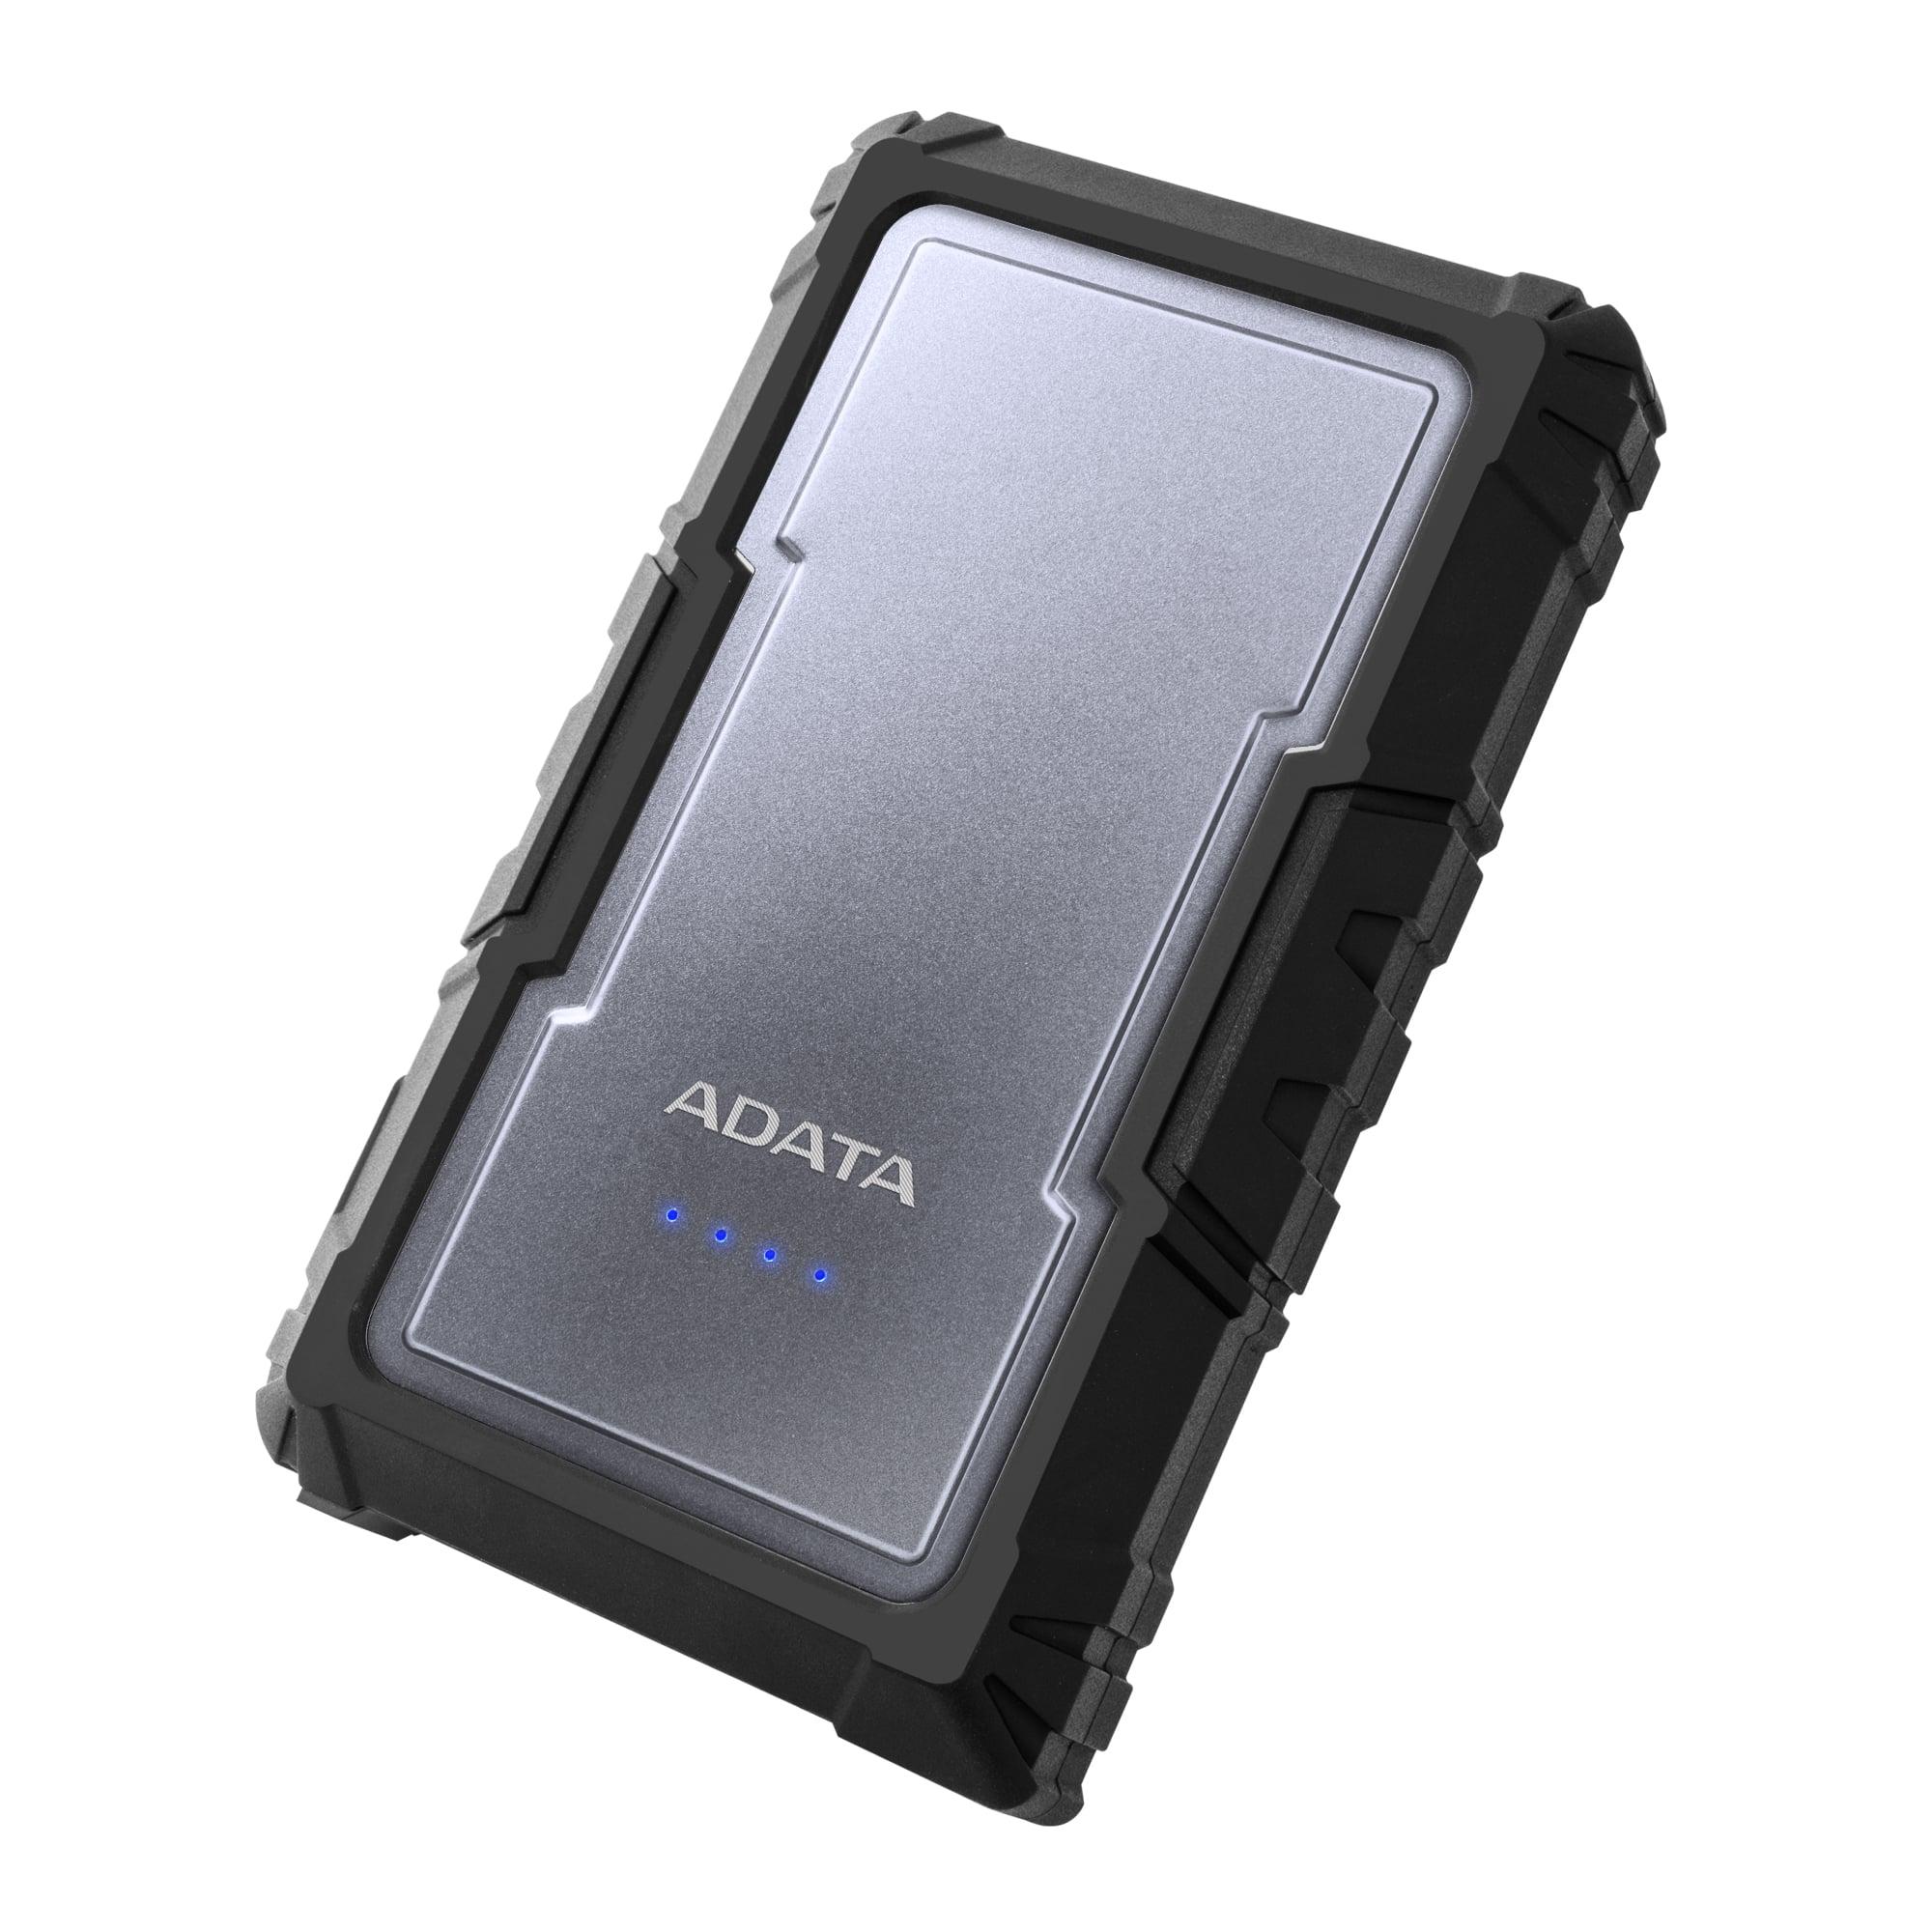 ADATA D6750 Power Bank 16750mAh, LED svítilna, stříbrná